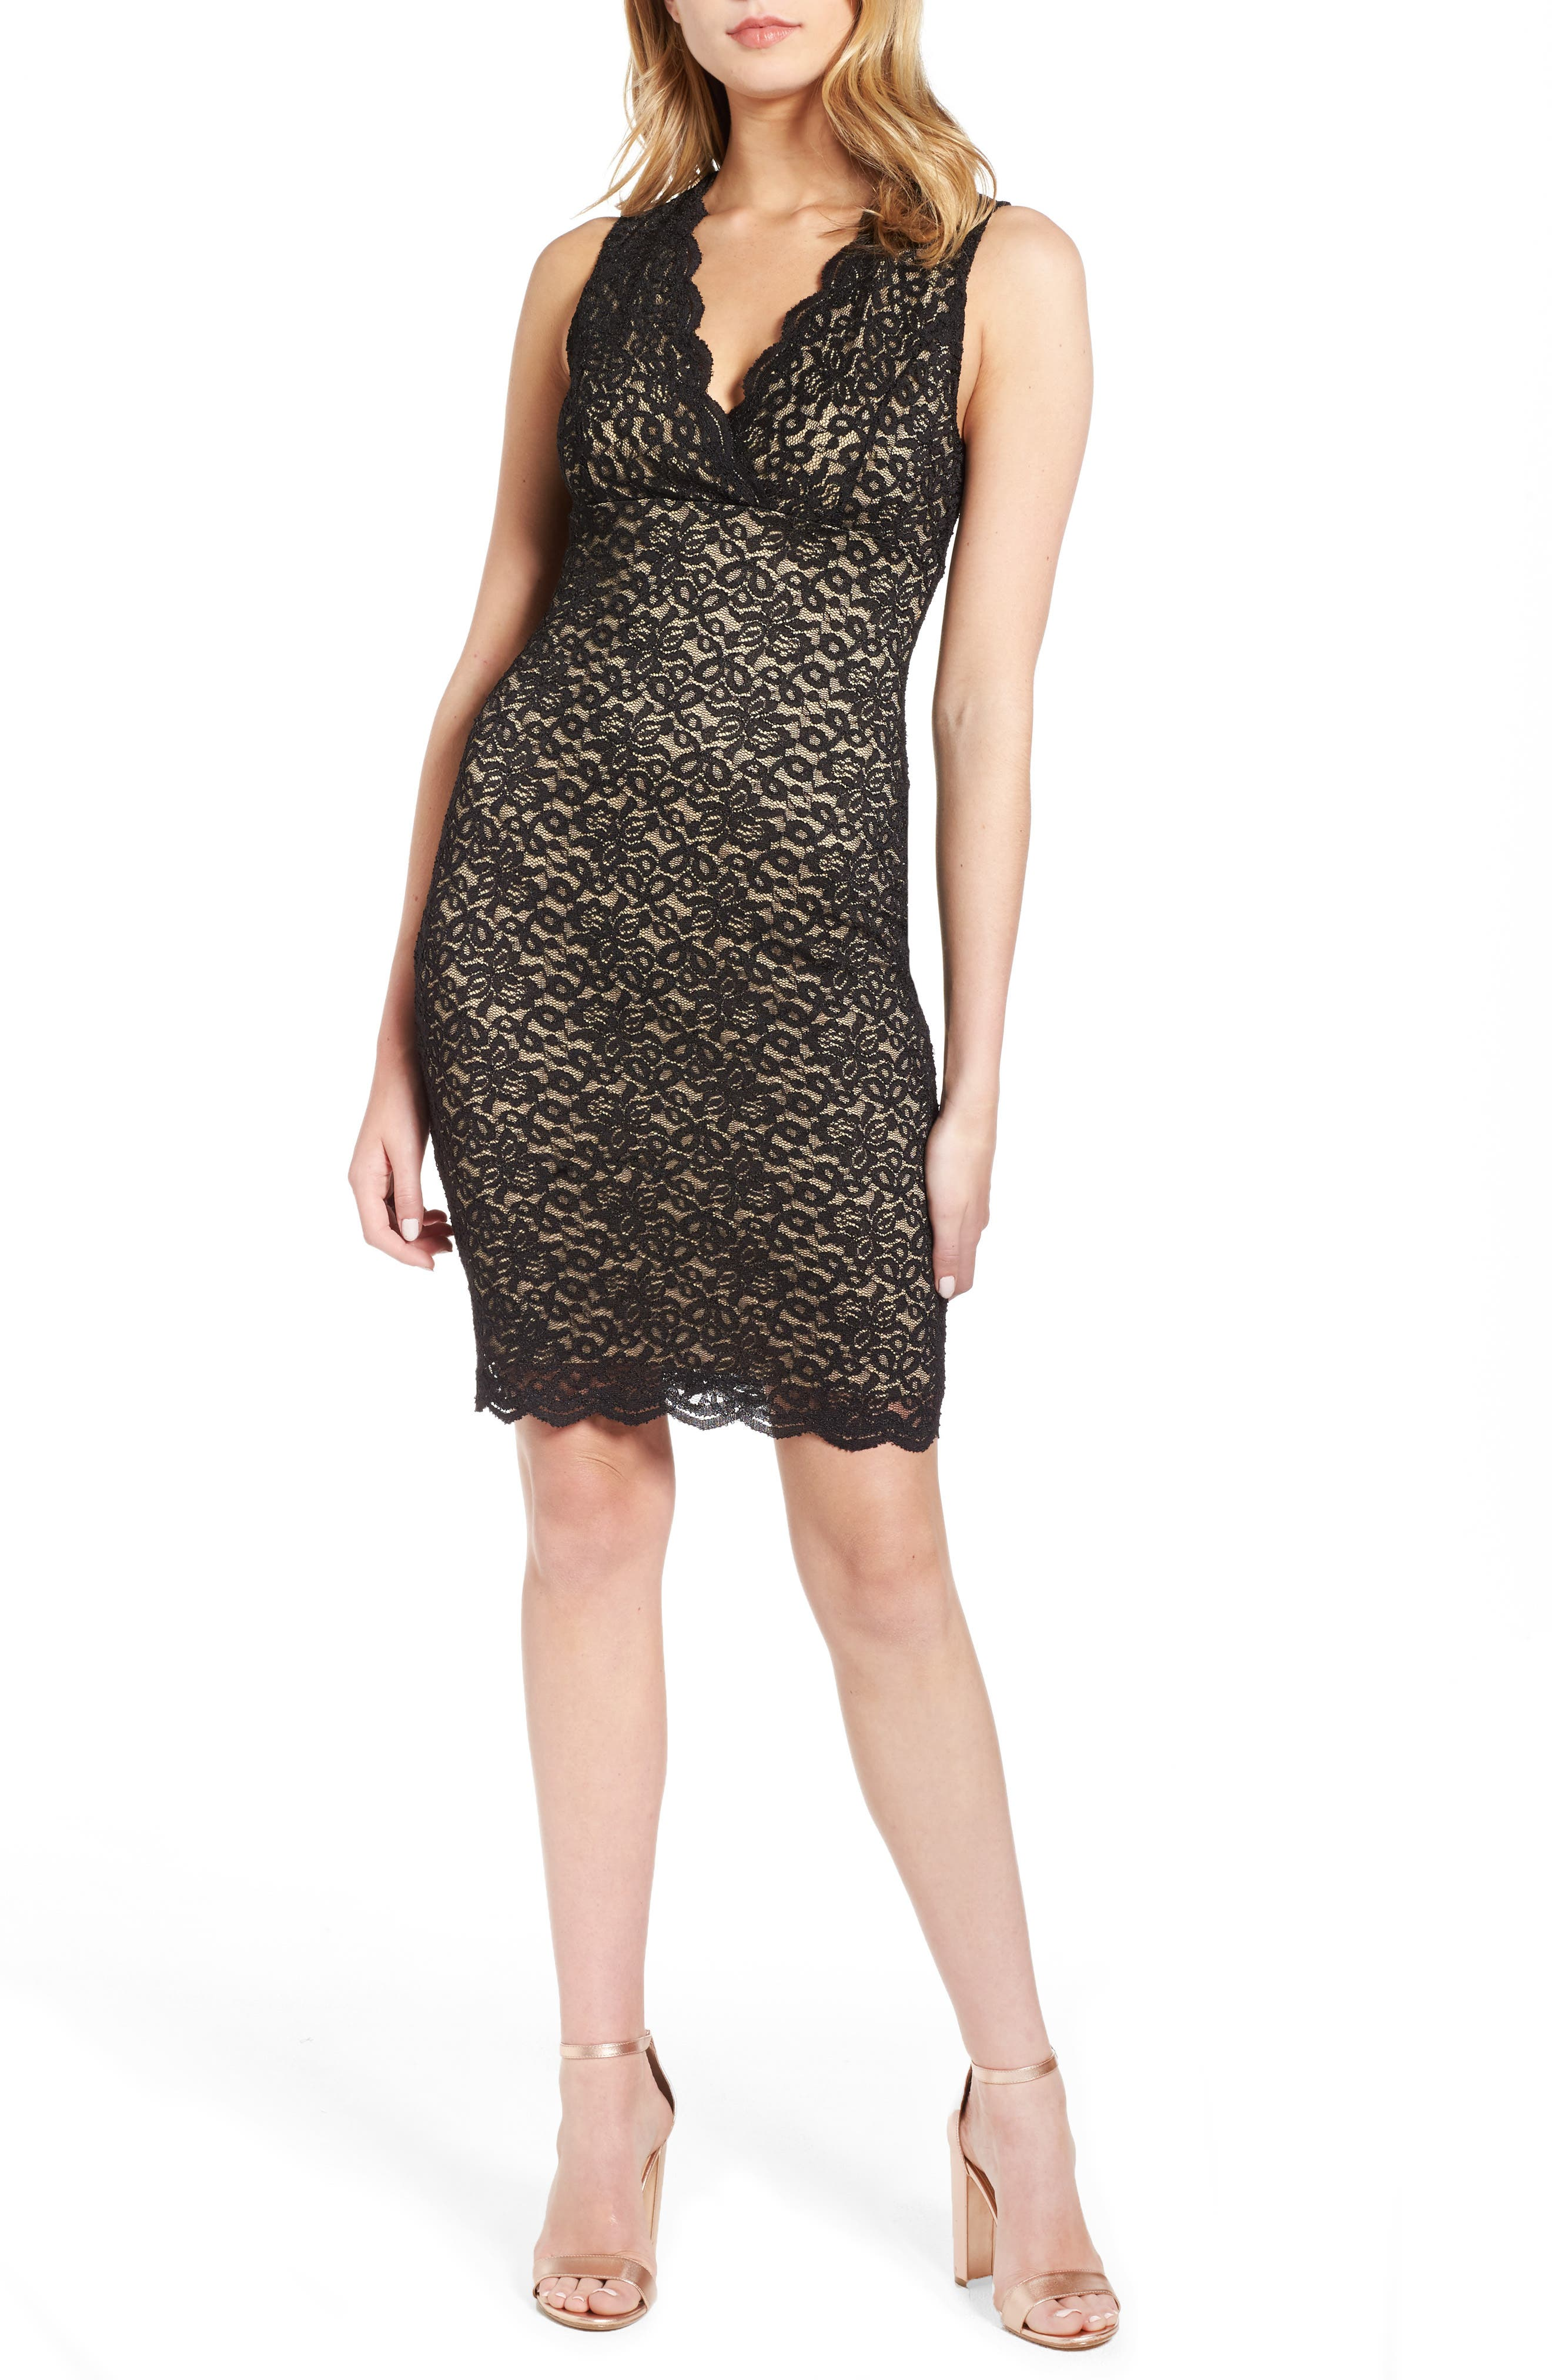 Alternate Image 1 Selected - Soprano Lace Body Con Dress